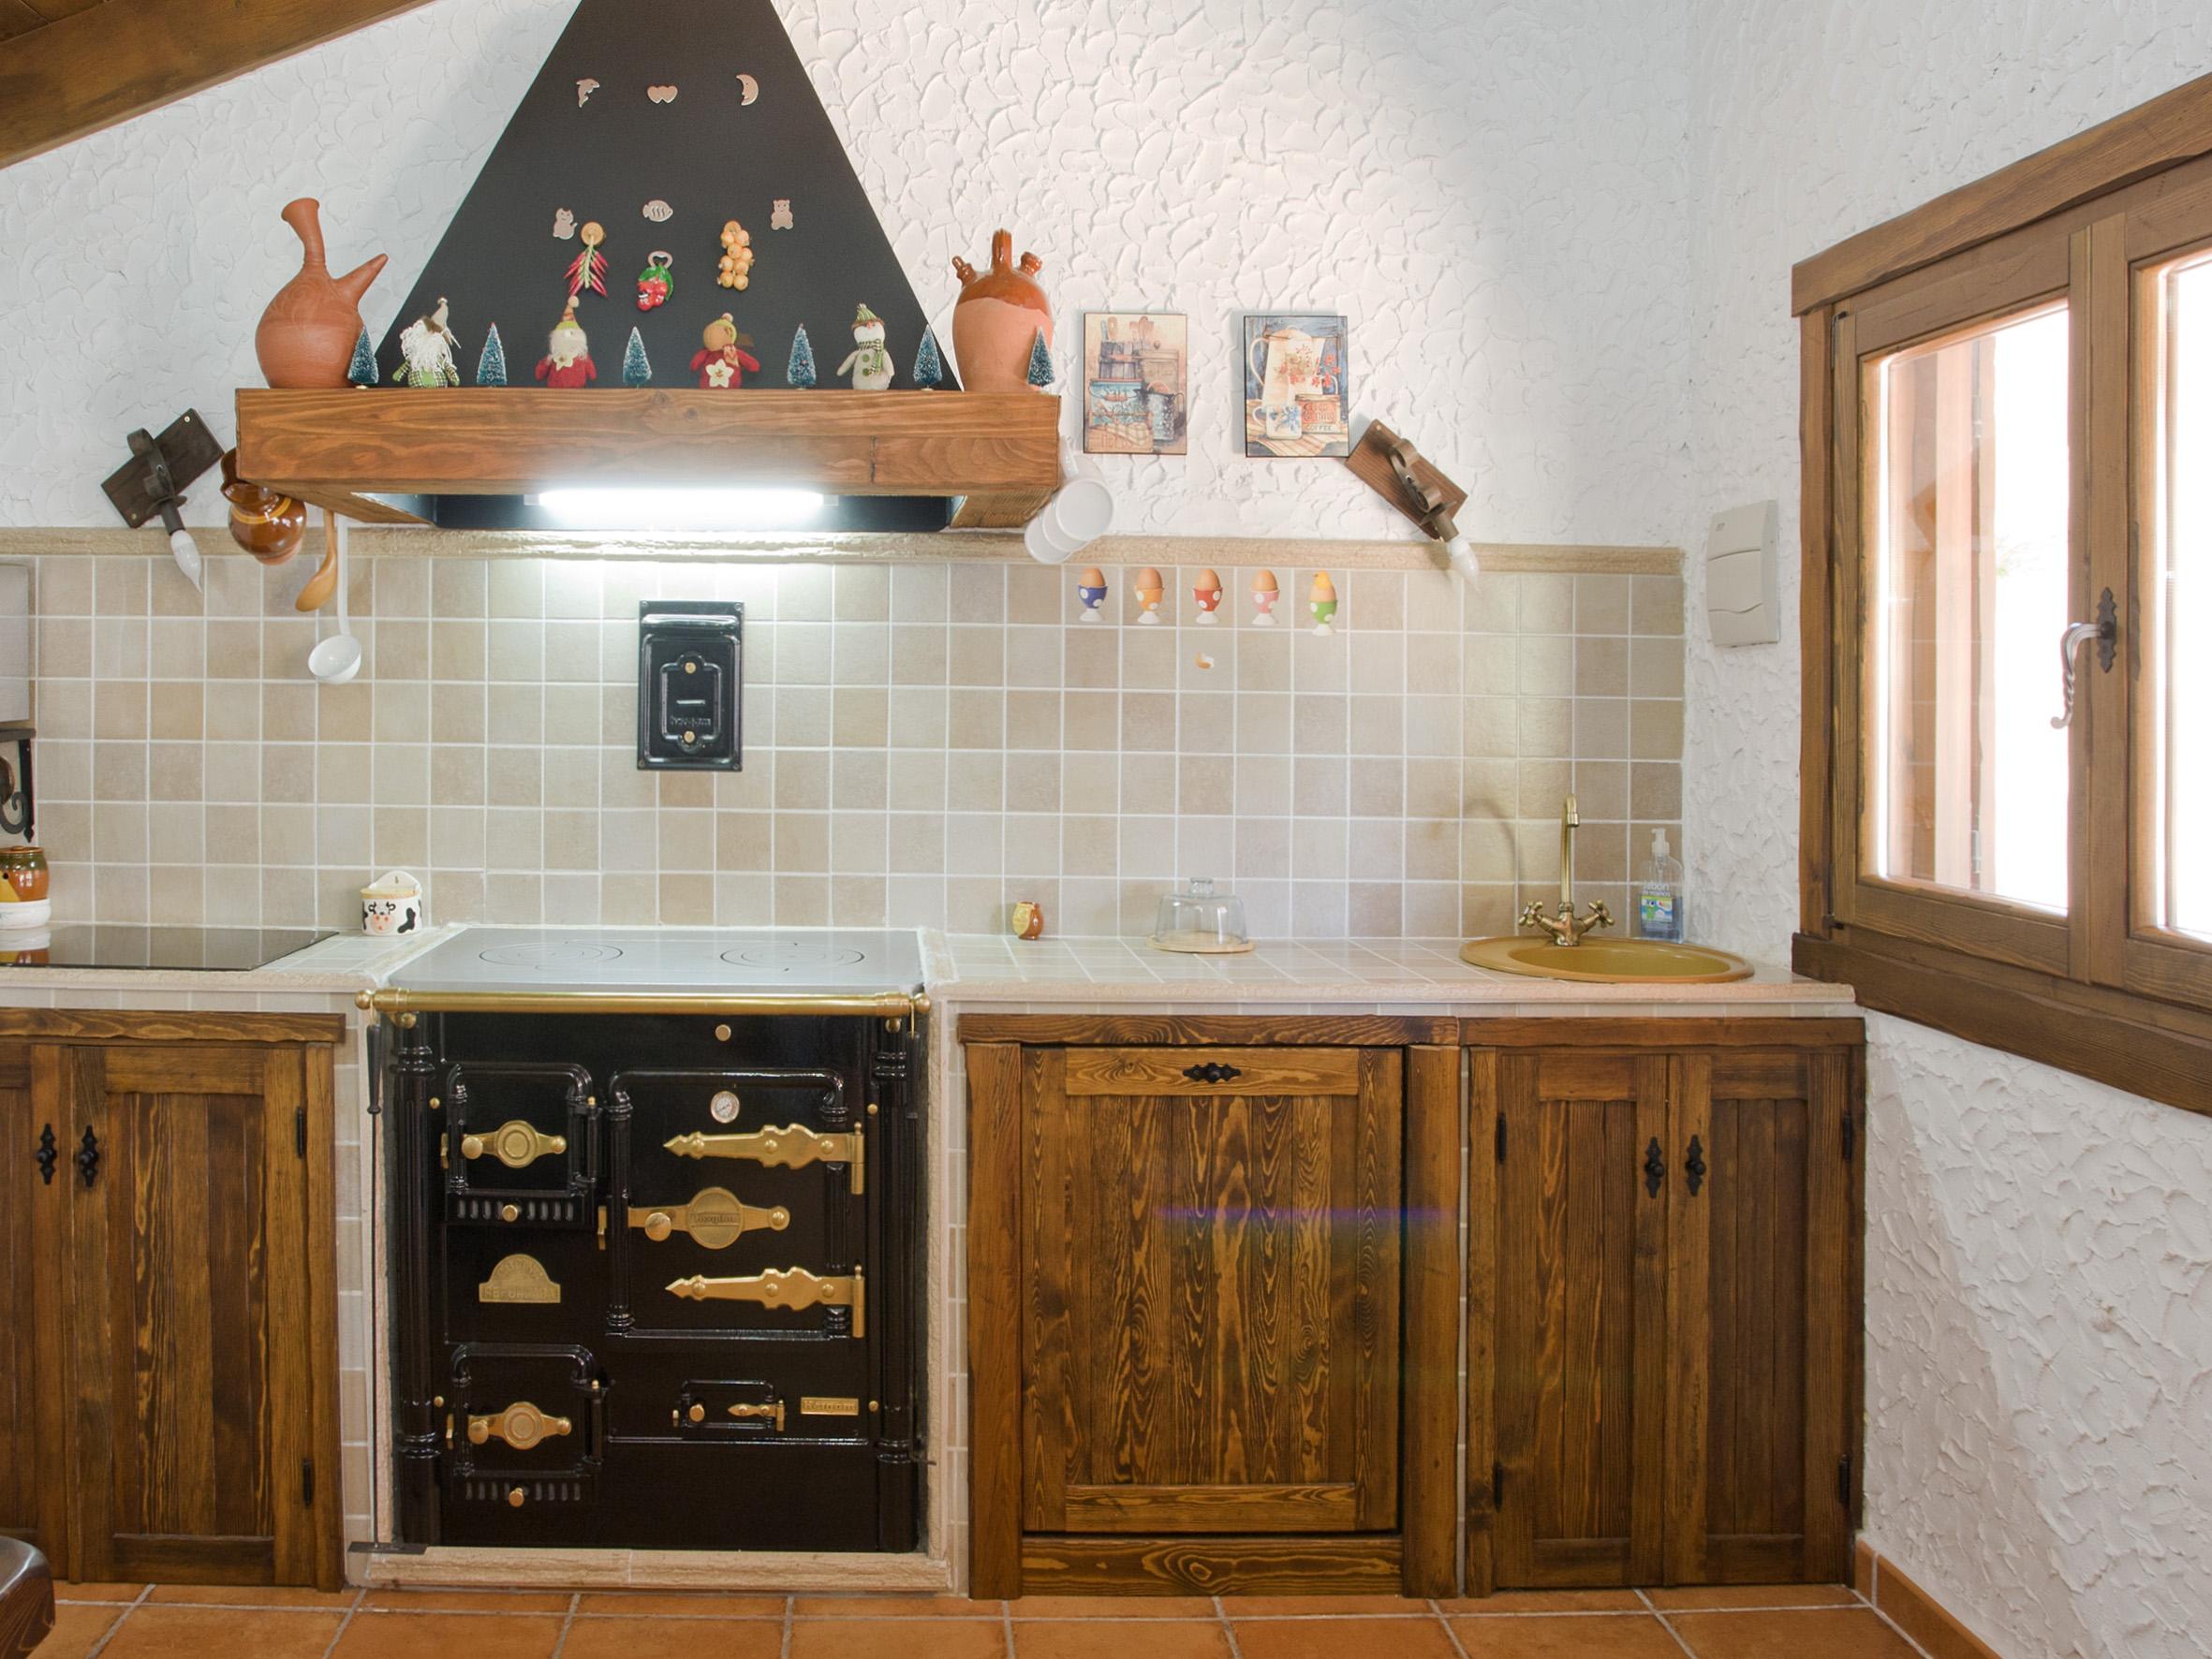 Cocina r stica para bodega chm - Cocinas rusticas de obra ...